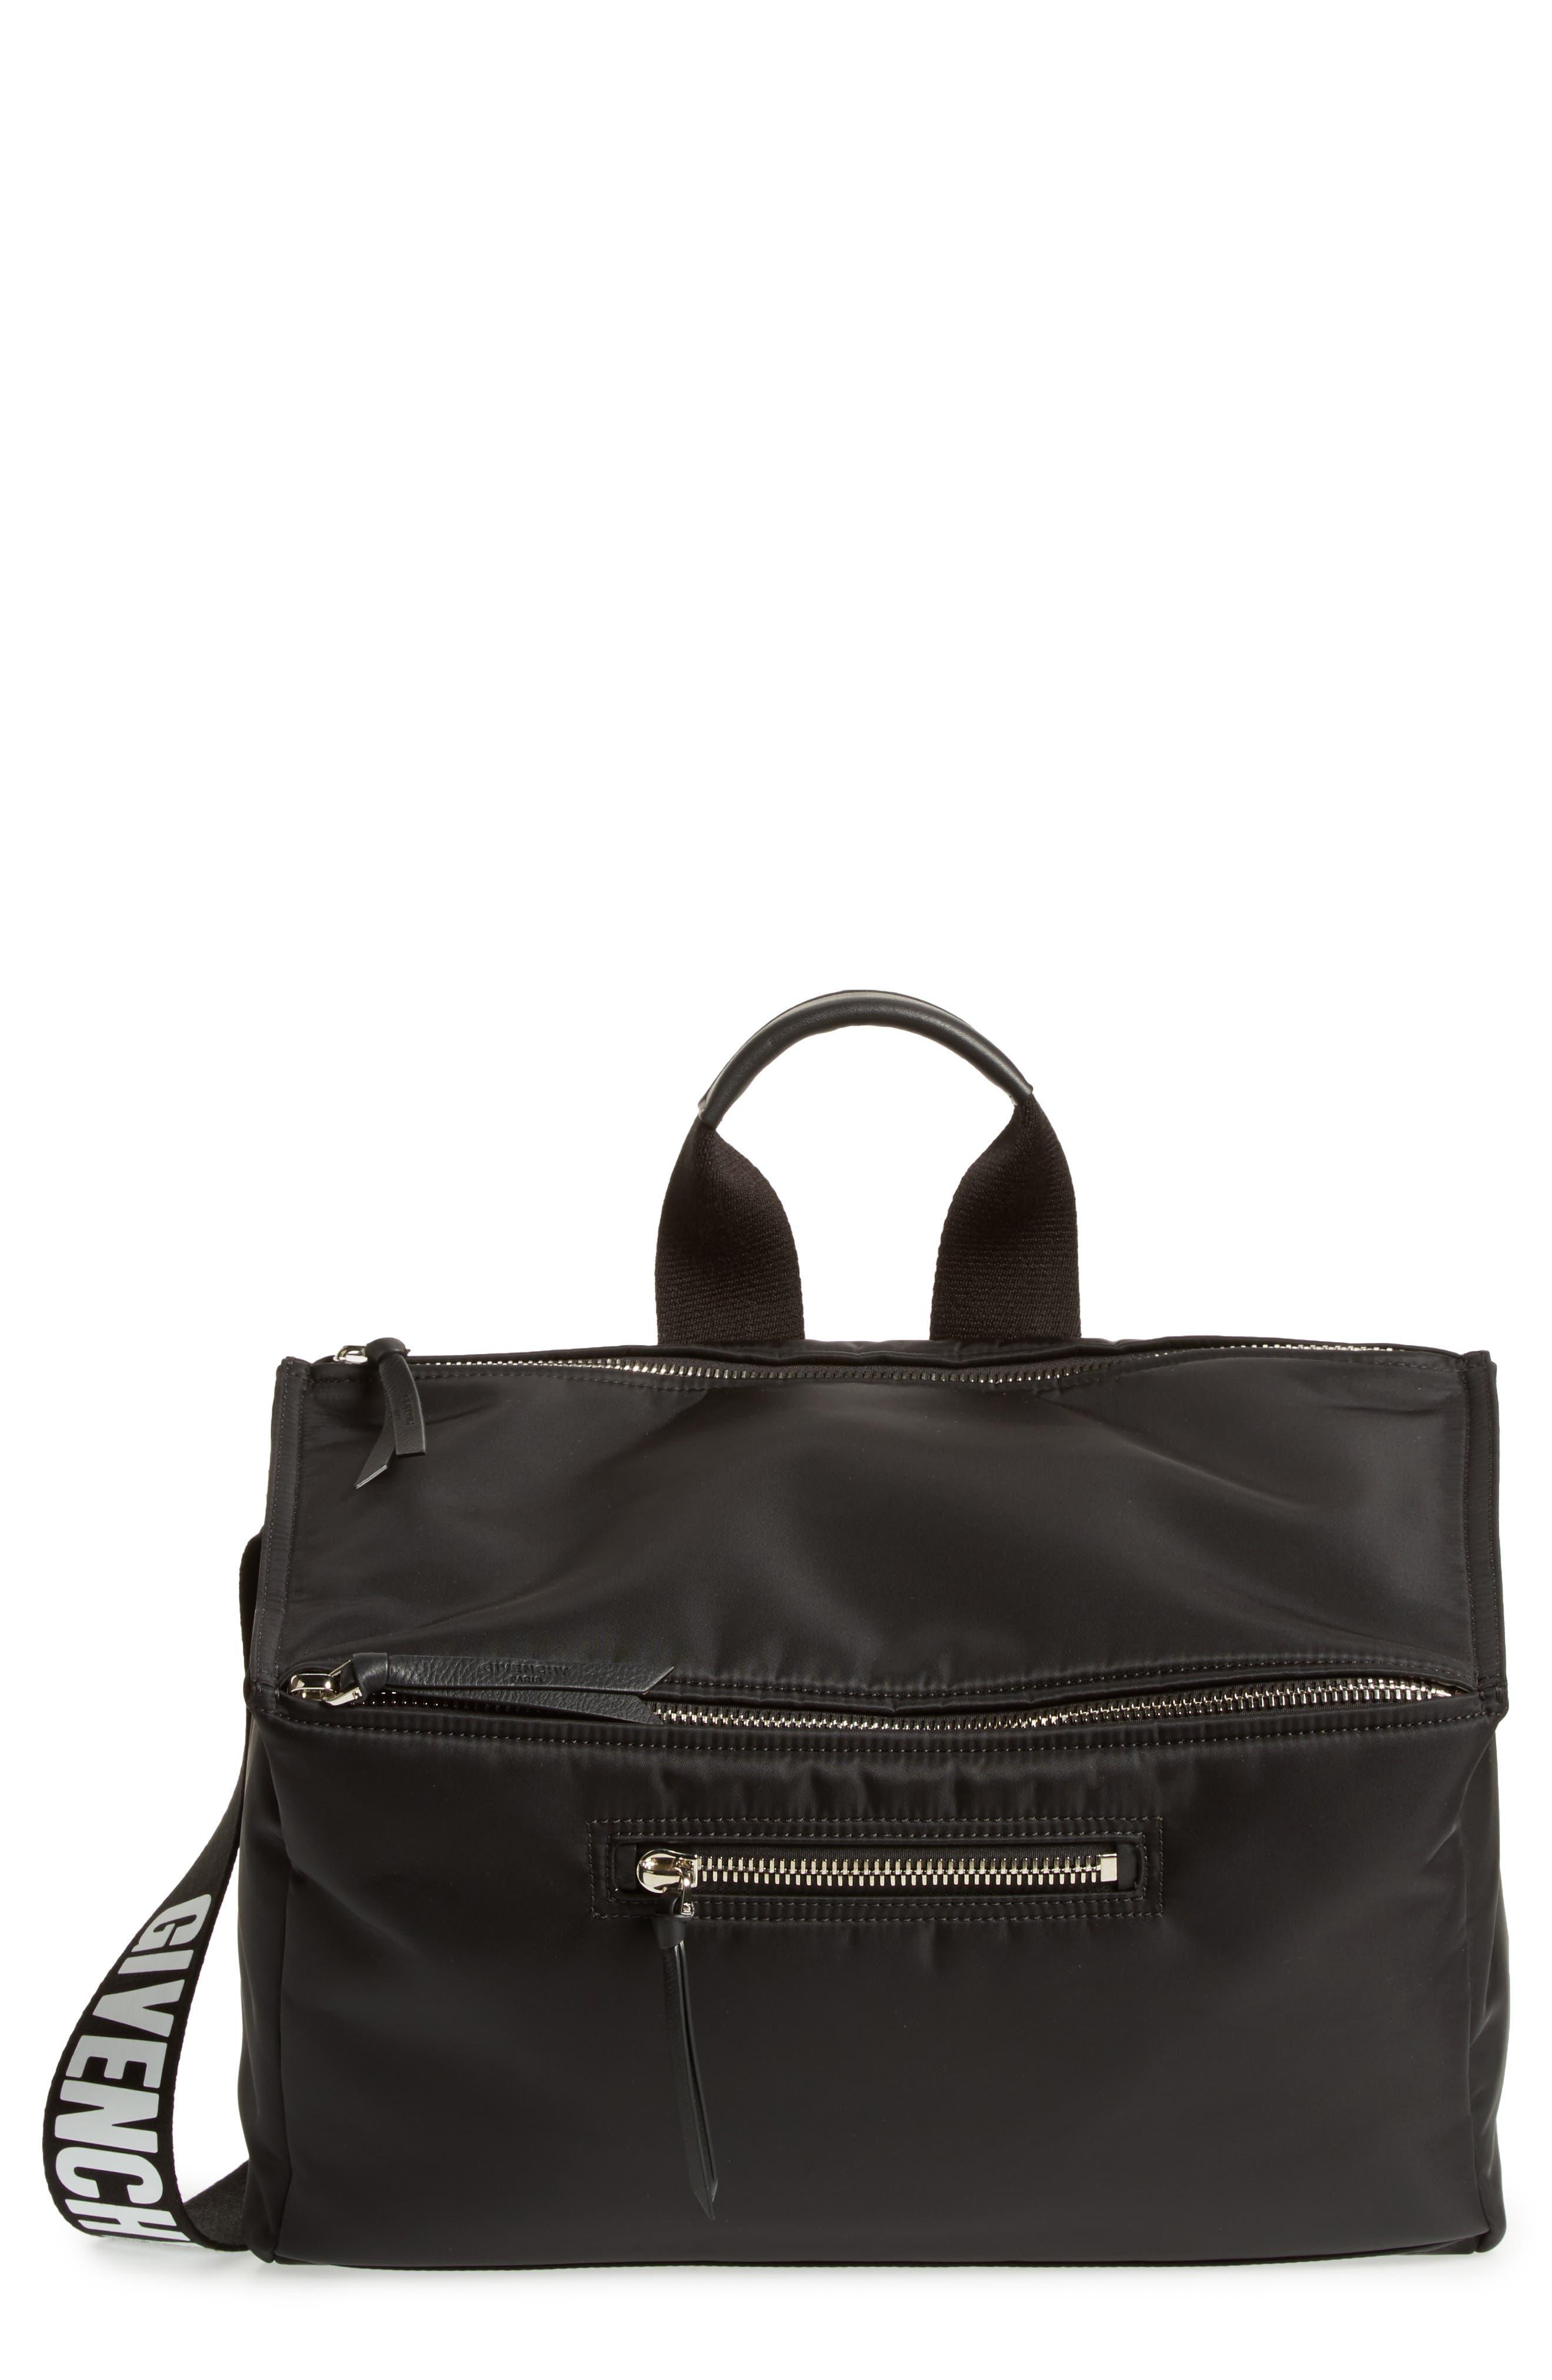 Paris Pandora Shoulder Bag,                         Main,                         color, 004